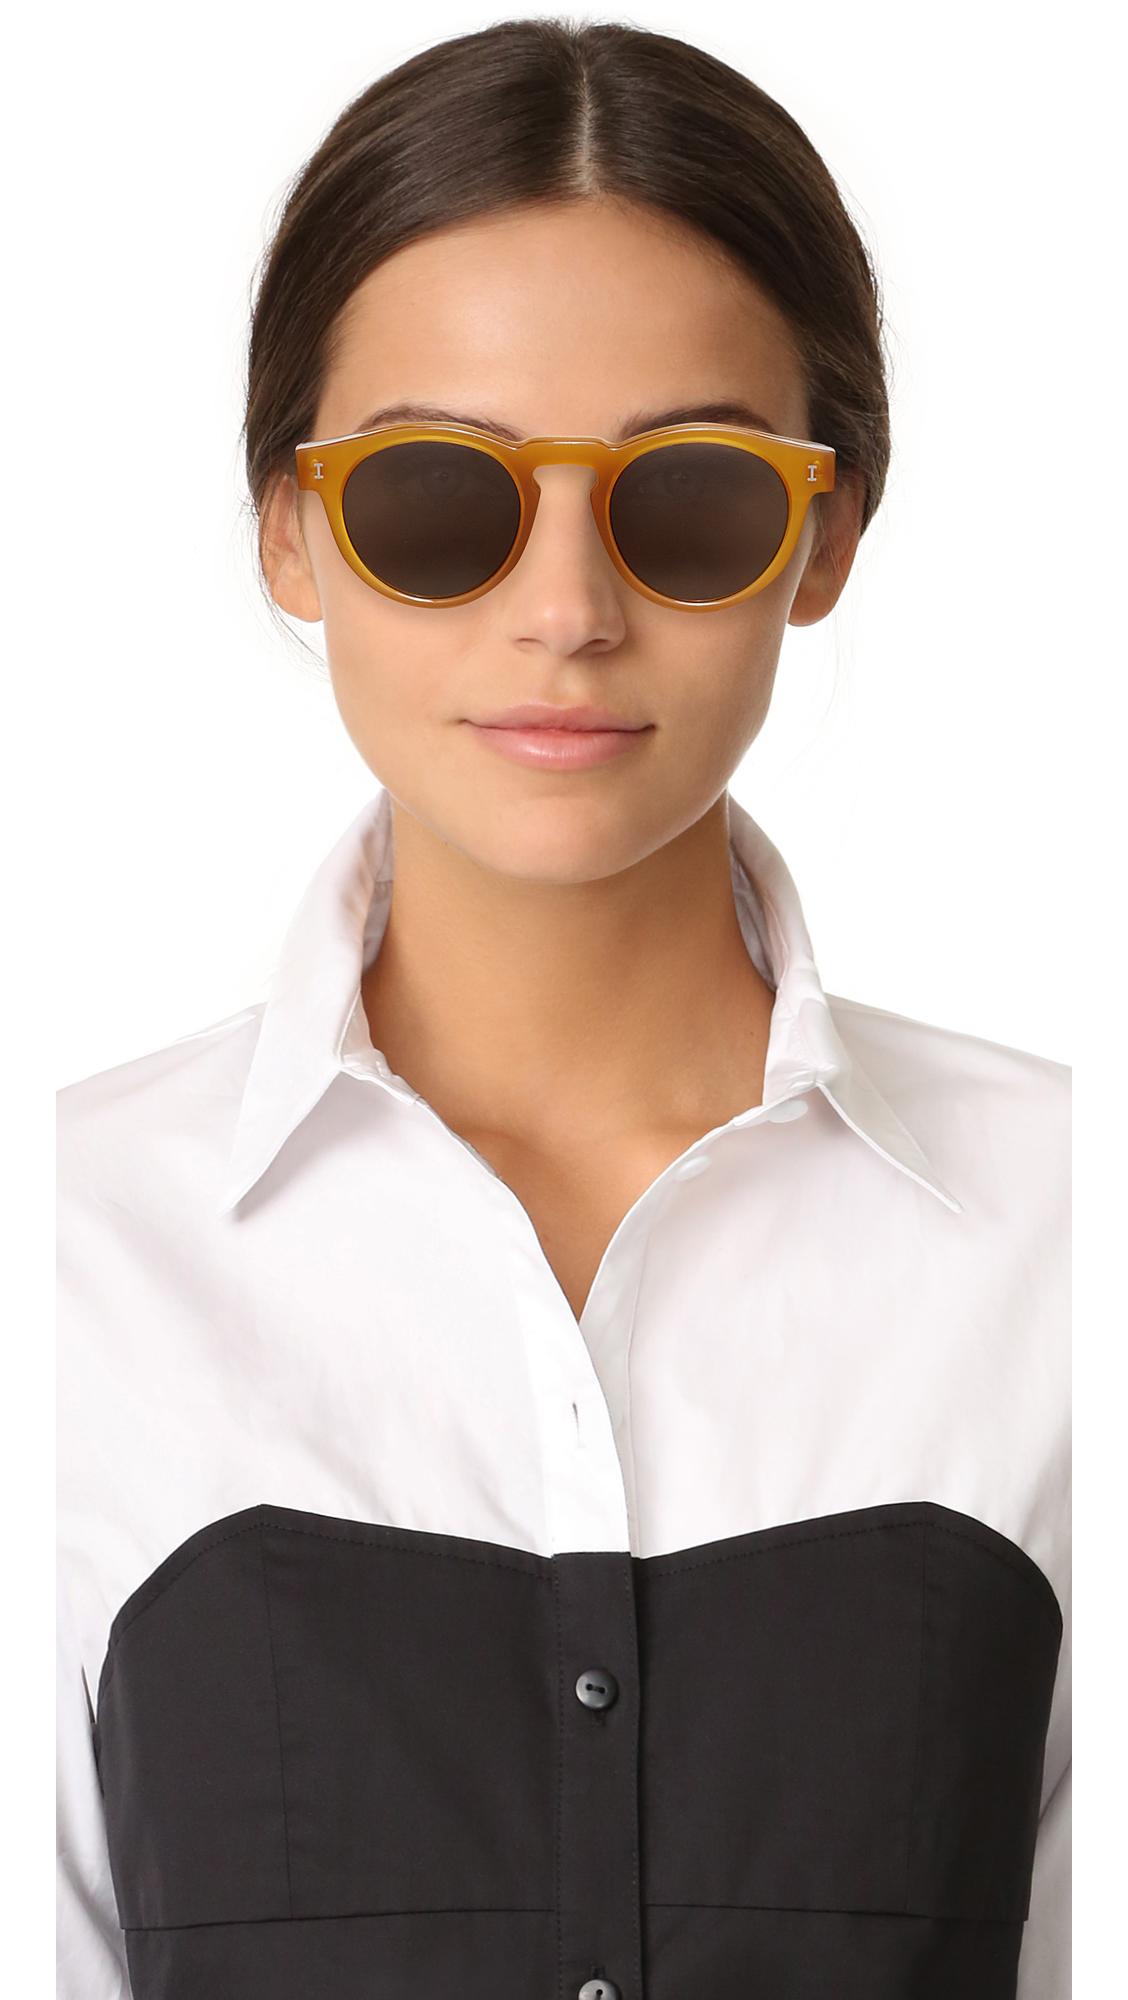 b7c0575a30 Illesteva Leonard Sunglasses